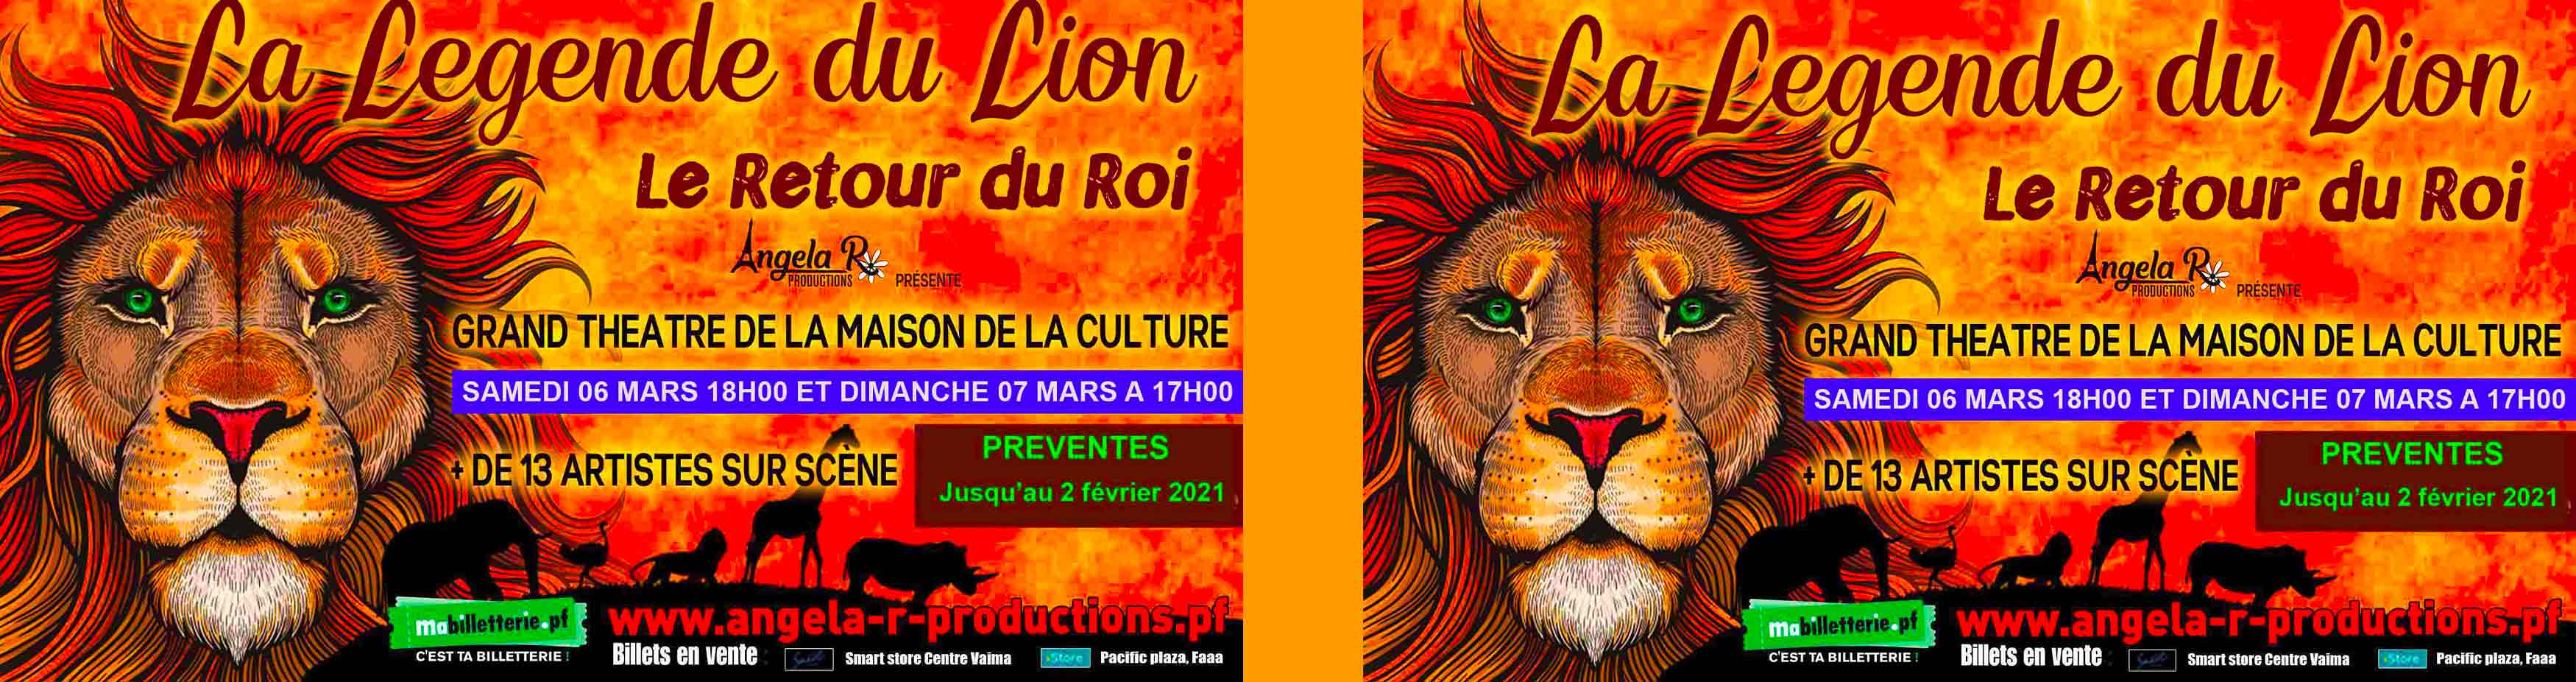 LA LEGENDE DU LION A TAHITI